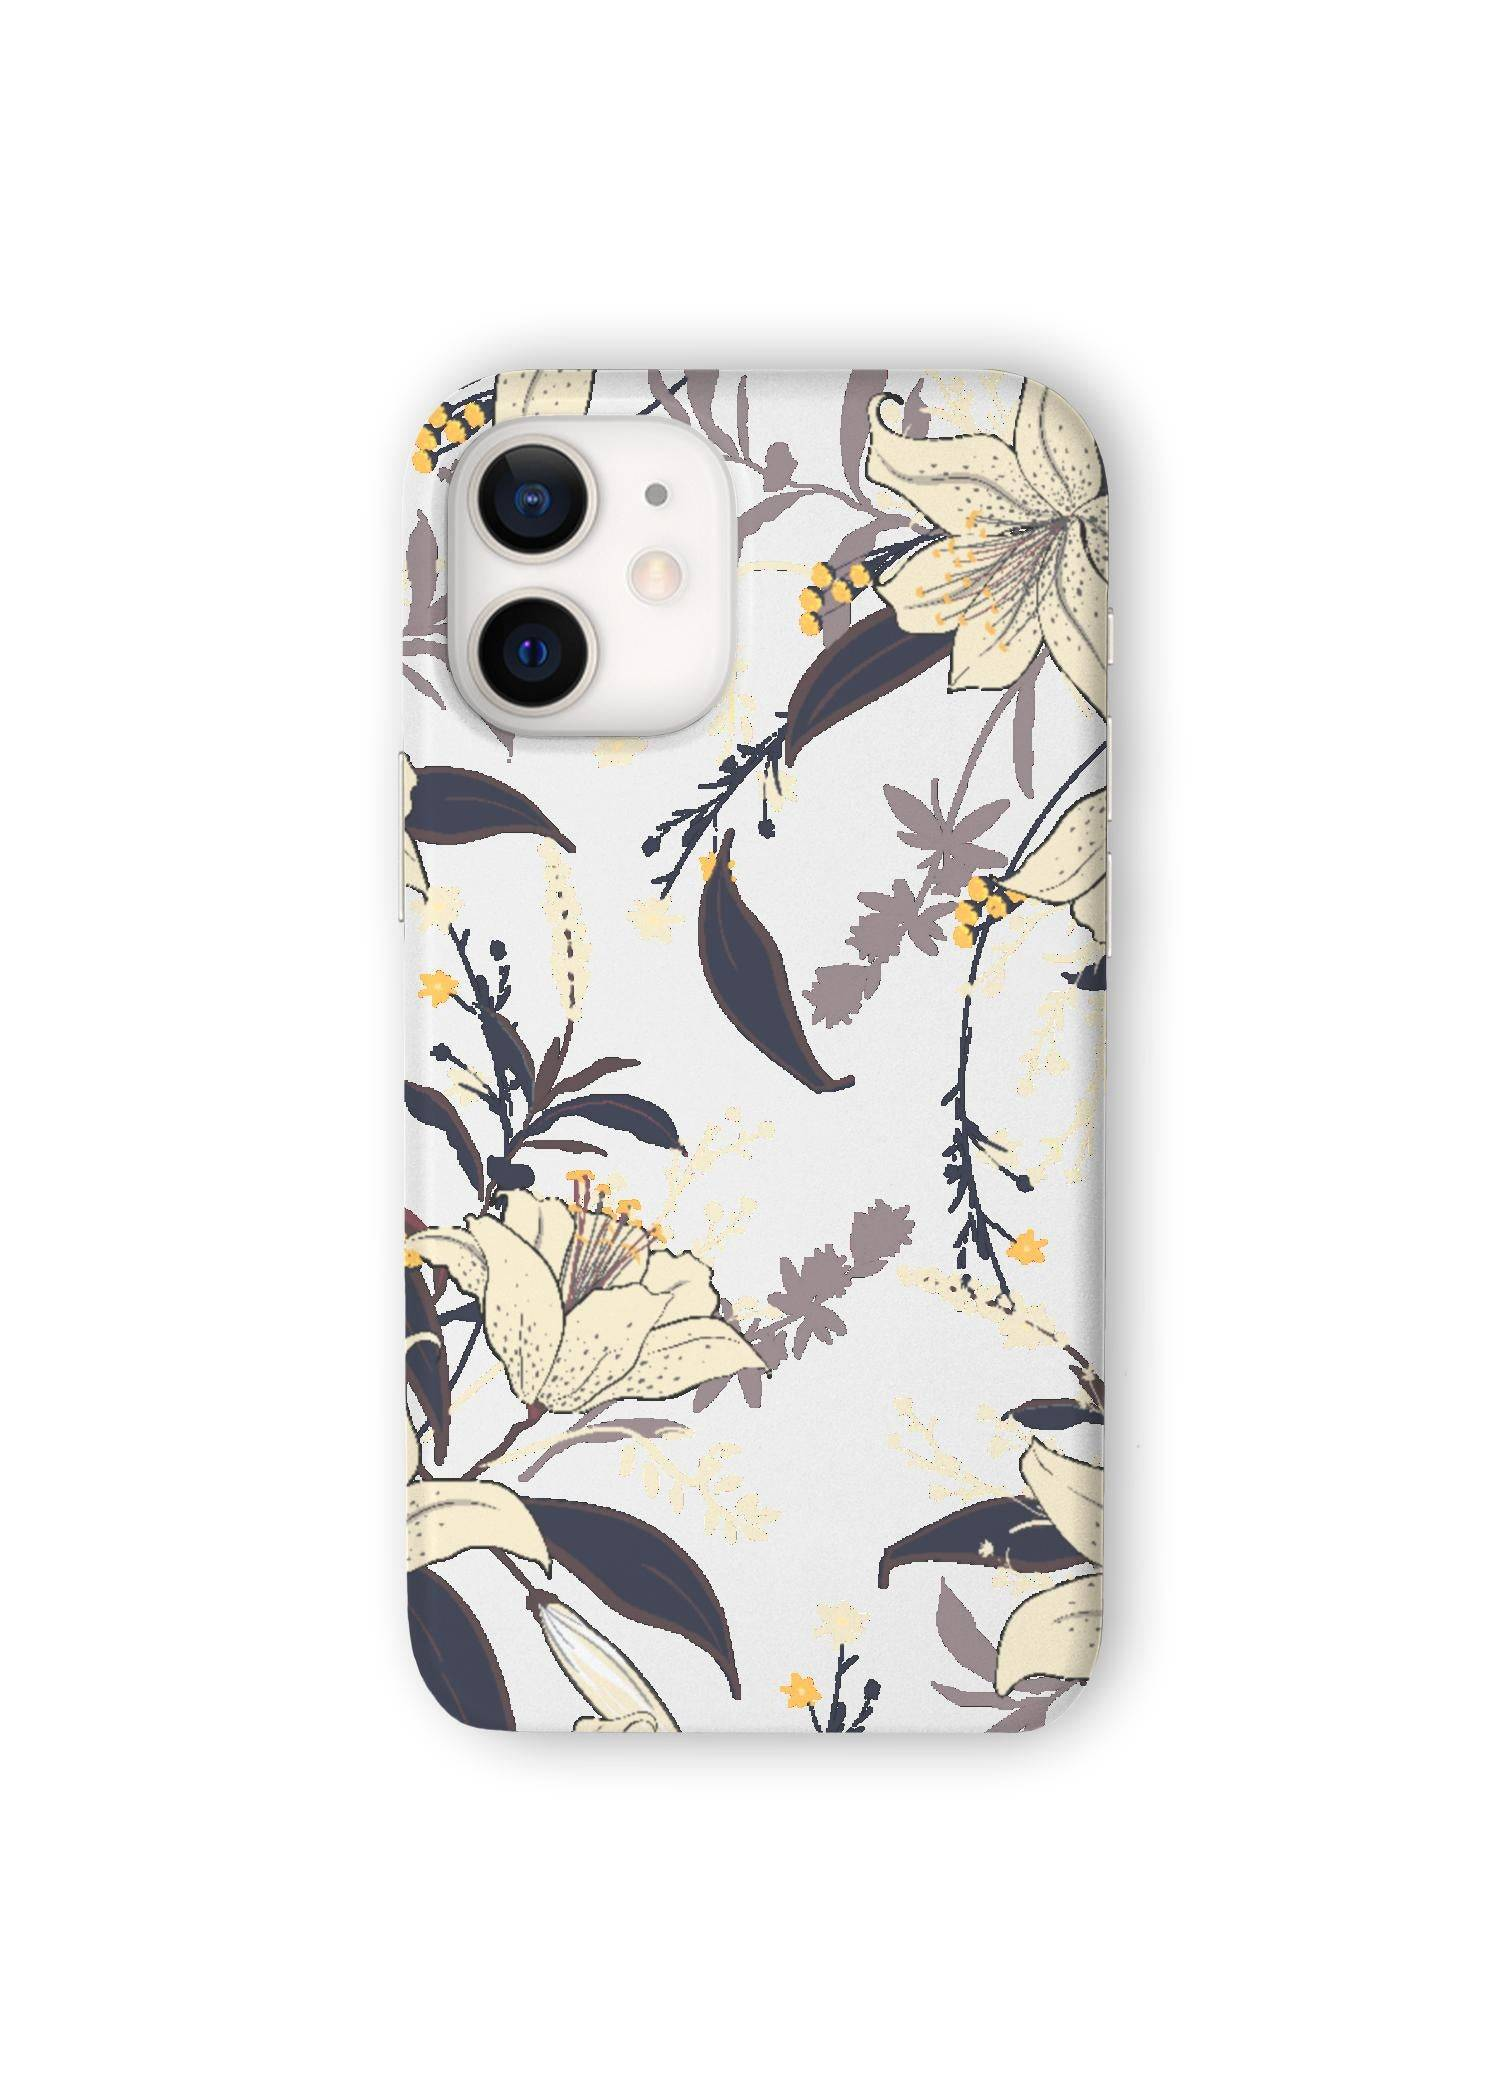 VIDA iPhone Case - Wild Garden by VIDA Original Artist  - Size: iPhone 12 Mini / Ultraslim